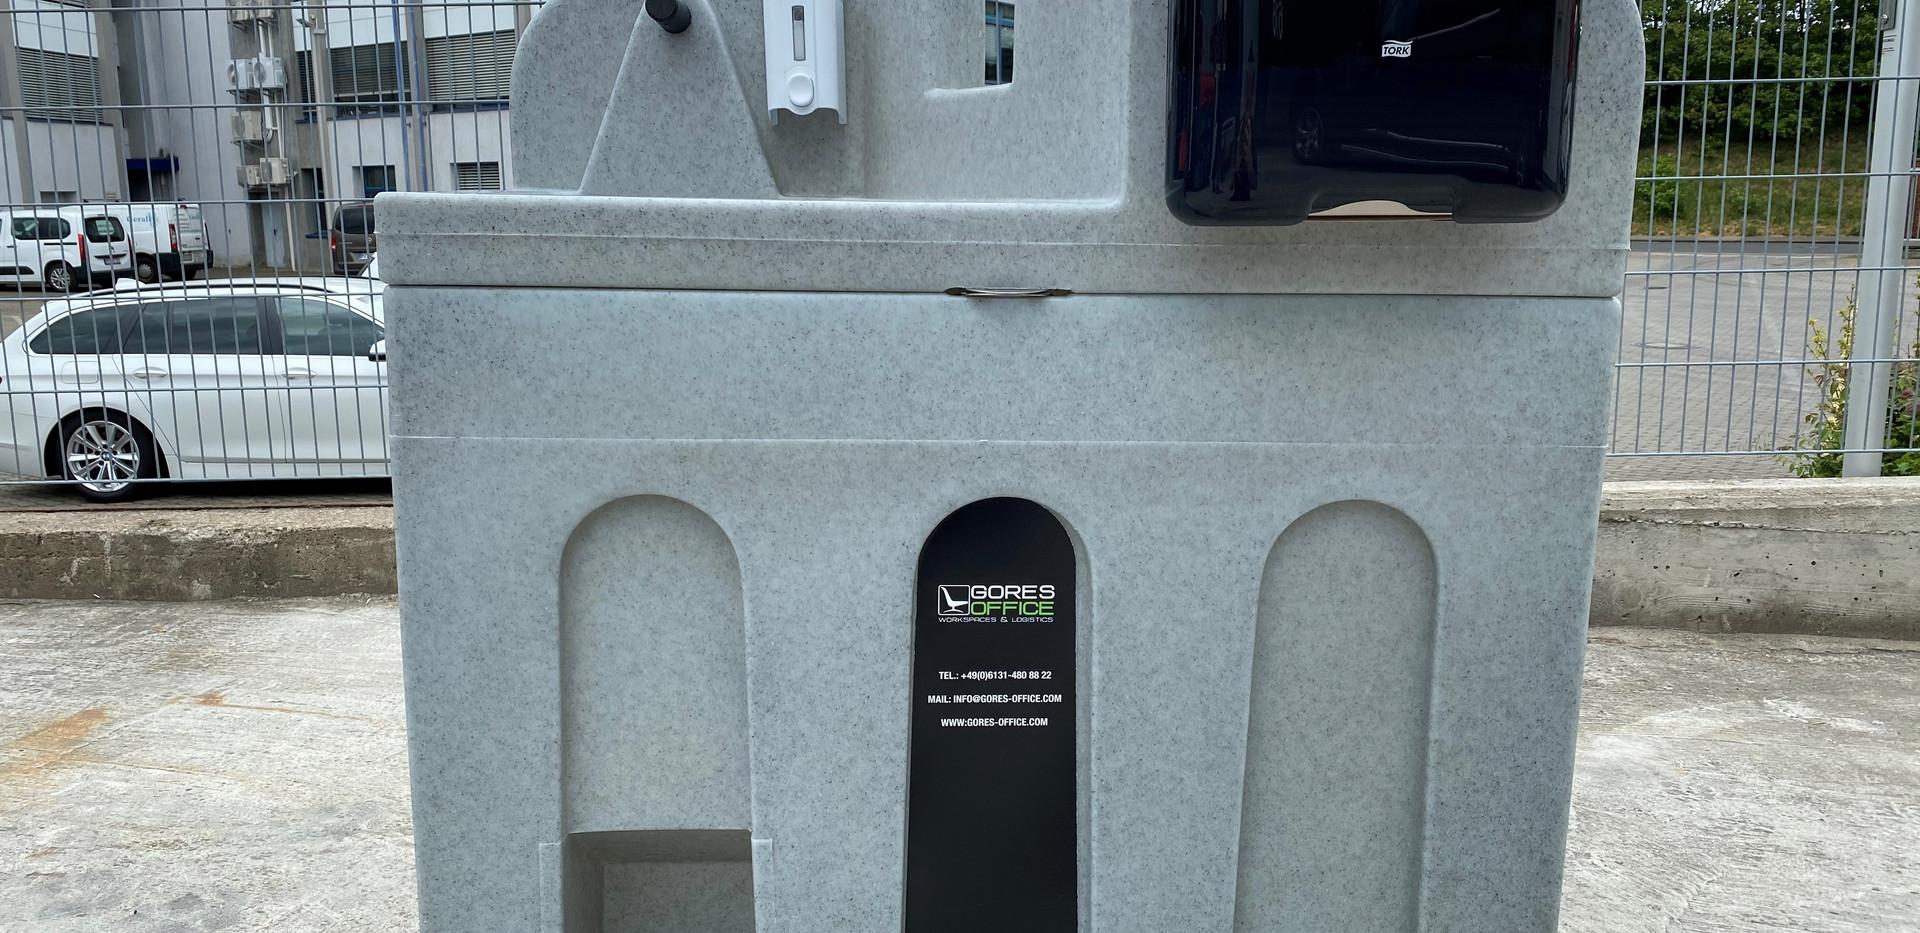 Gores Office Handwaschbecken Front.jpg